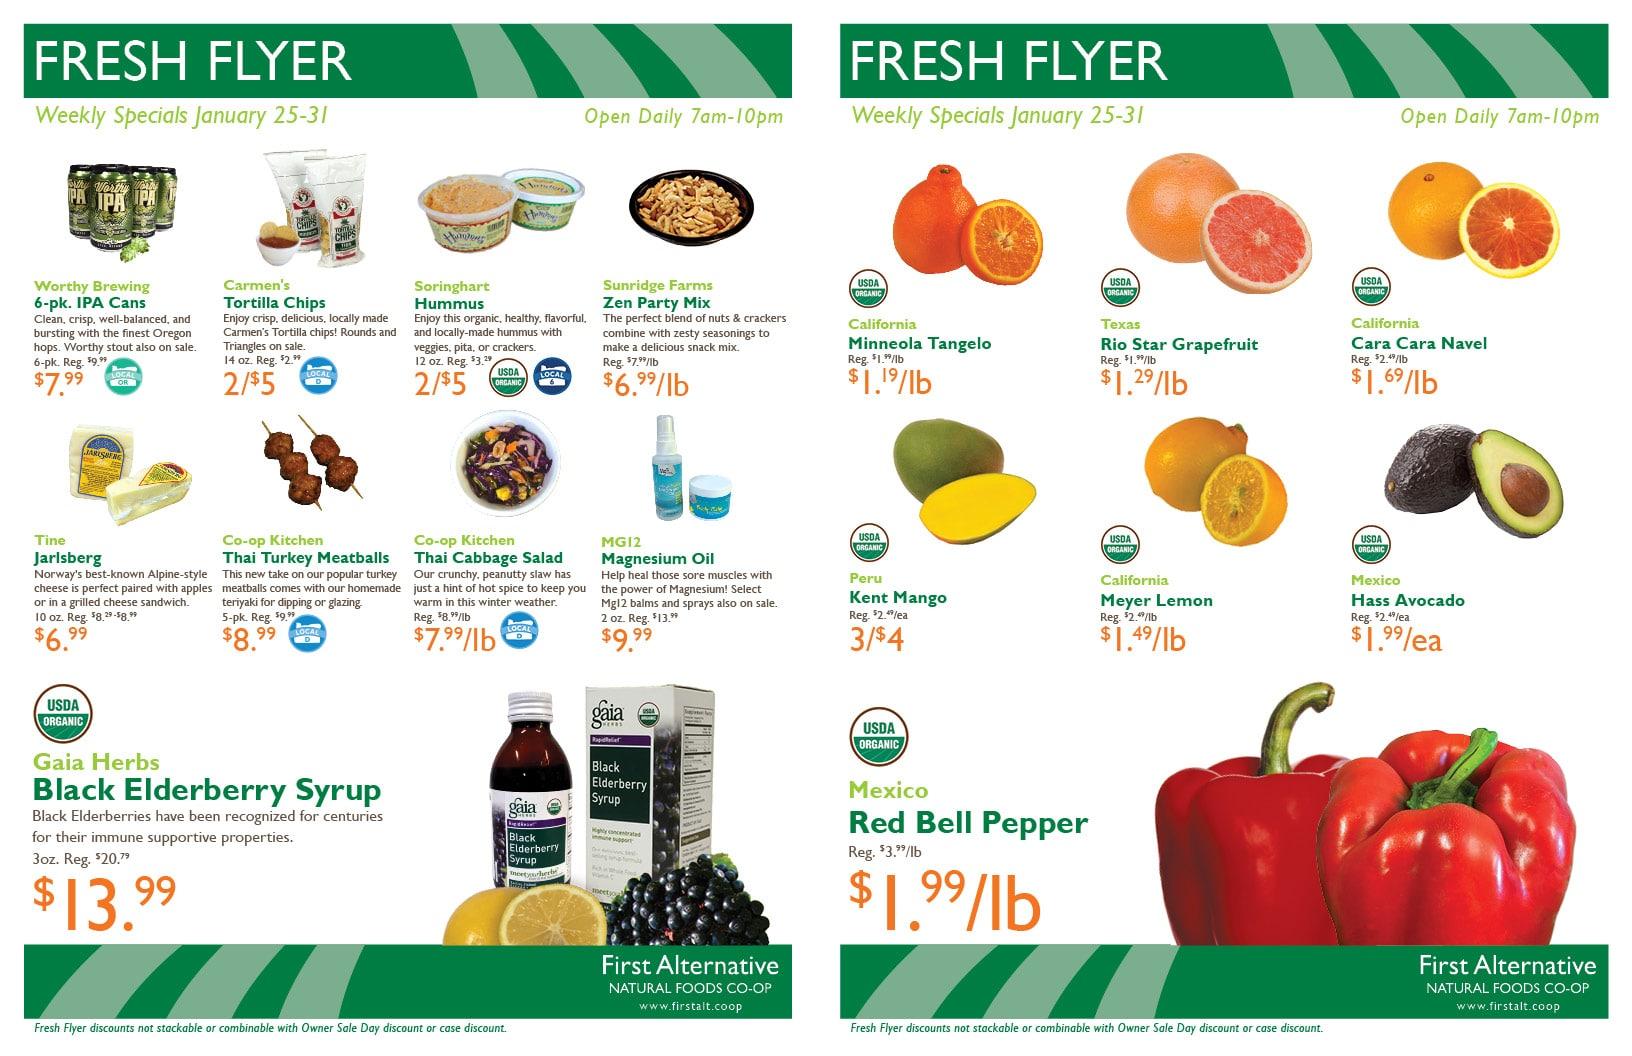 First Alternative Fresh Flyer Jan 25-31